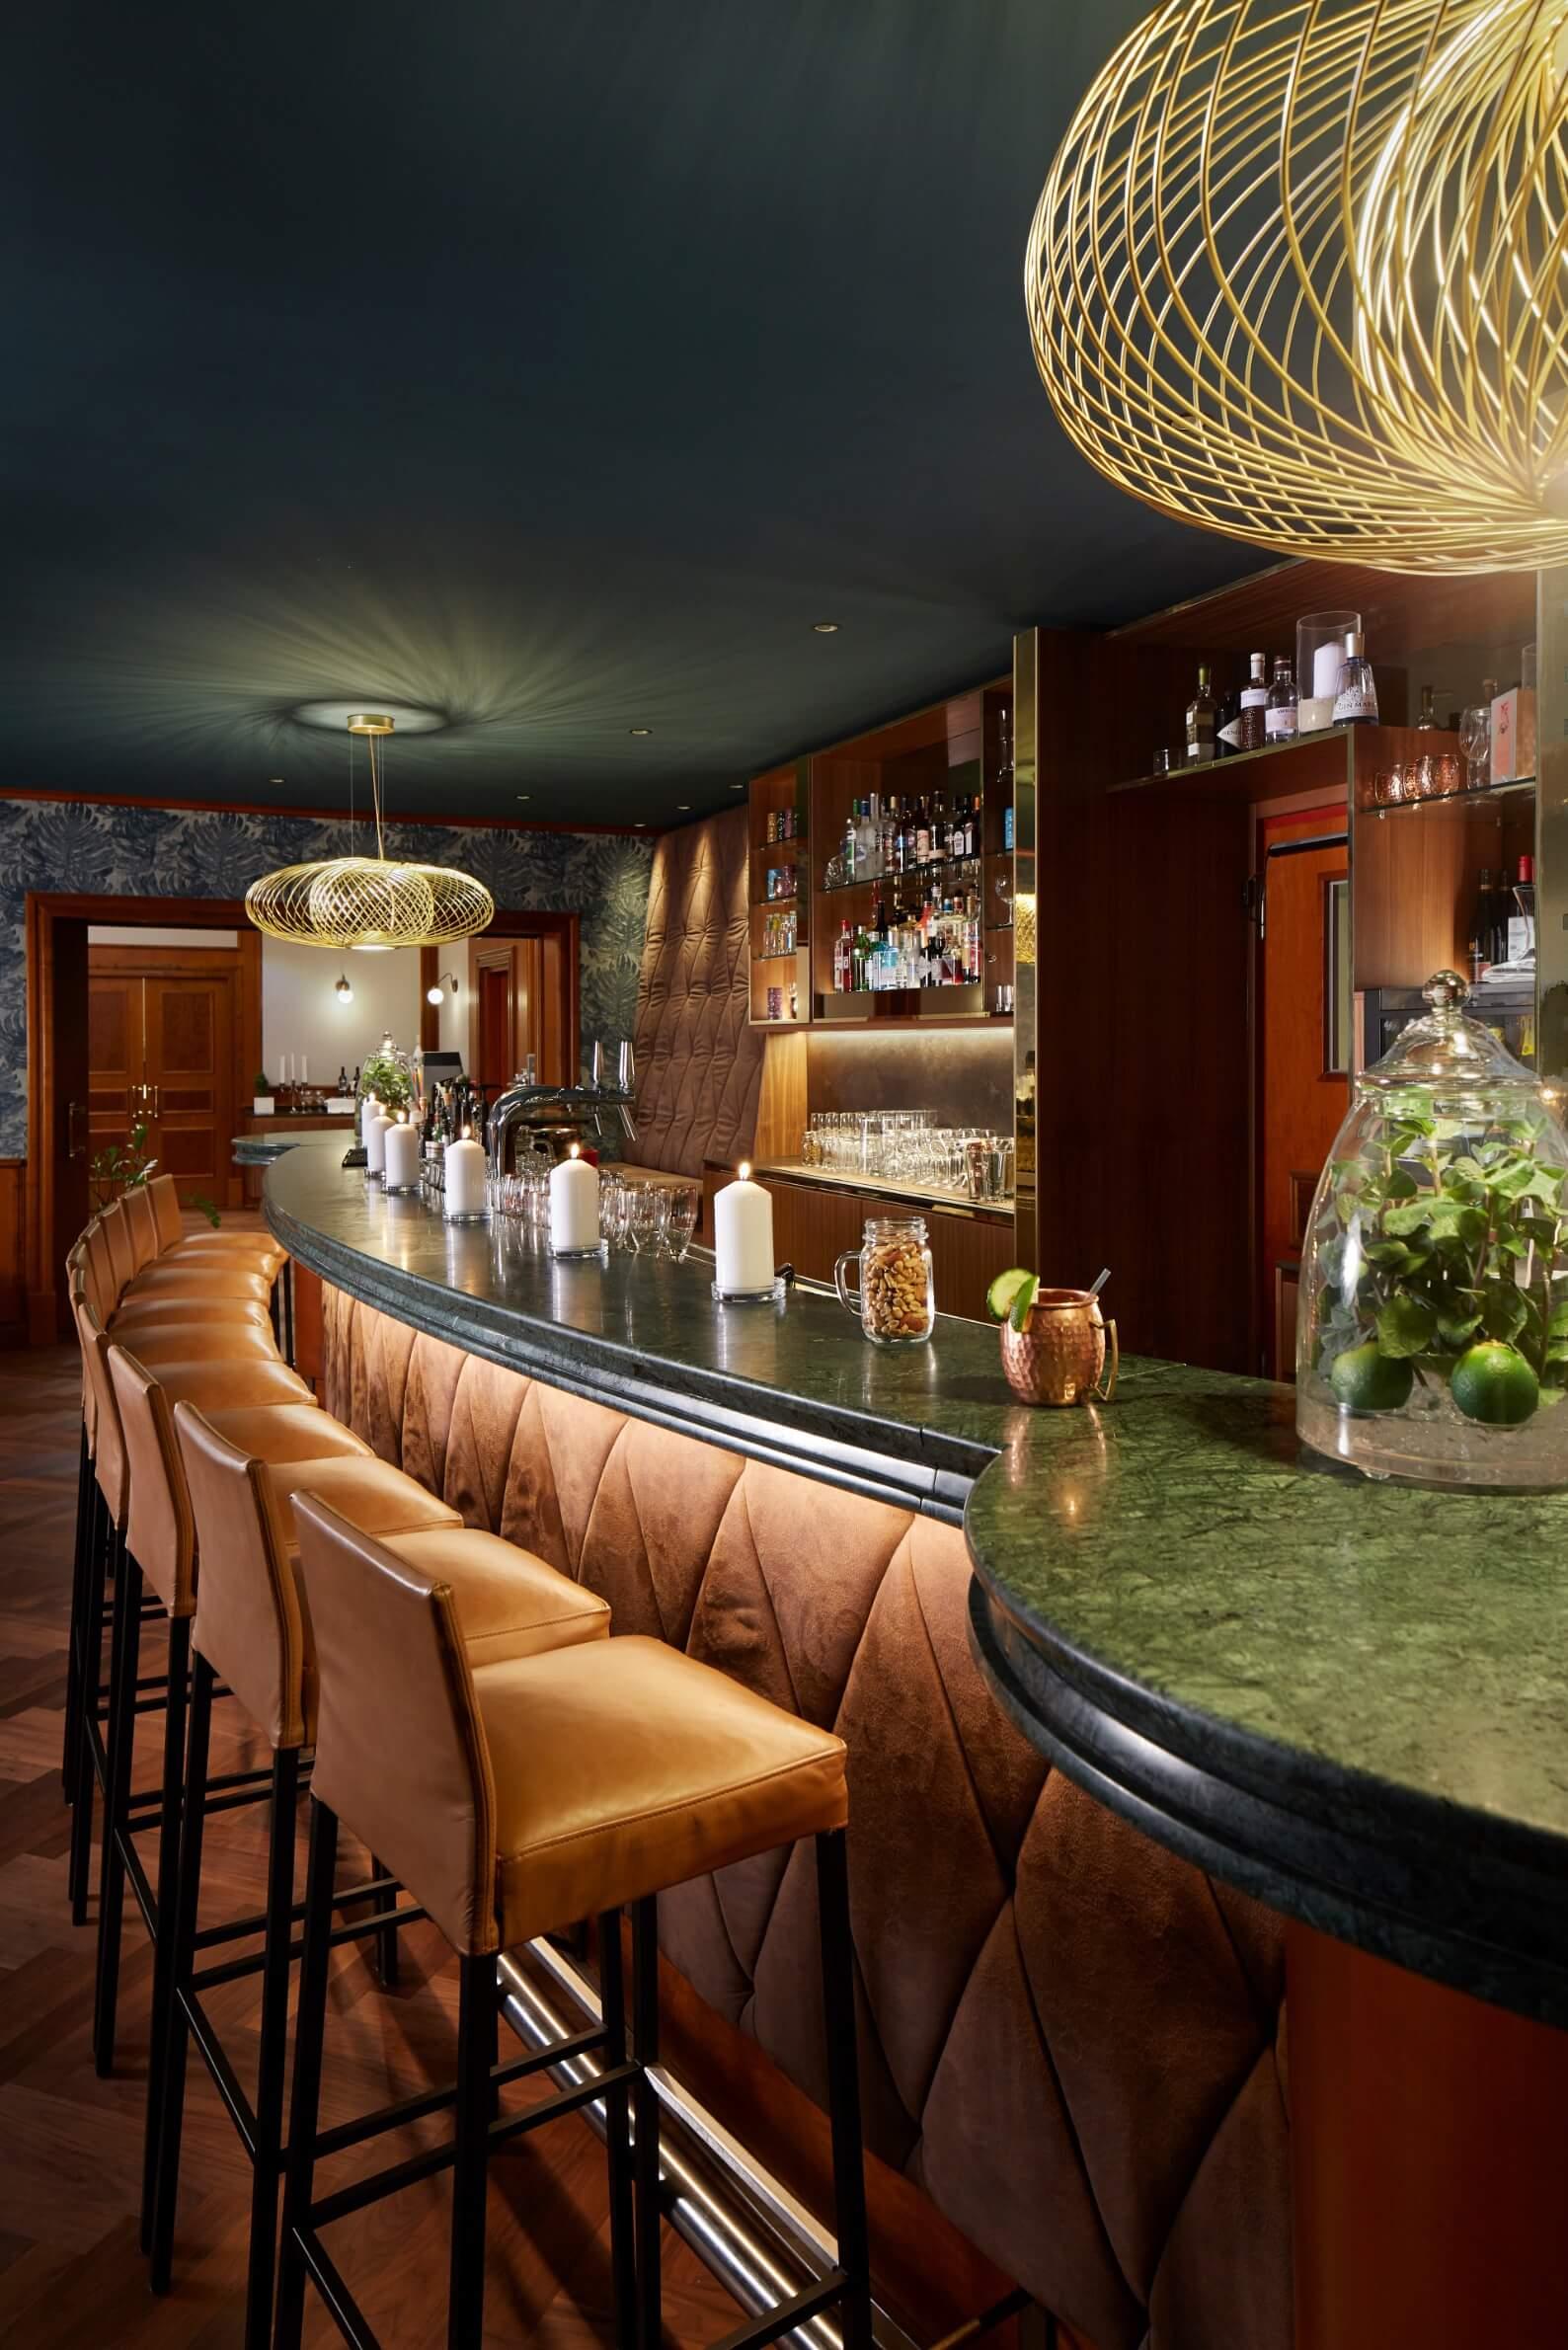 h-hotels_bar-01-hyperion-hotel-berlin_Original-kommerz.-Nutzung-_423ffa83@2x